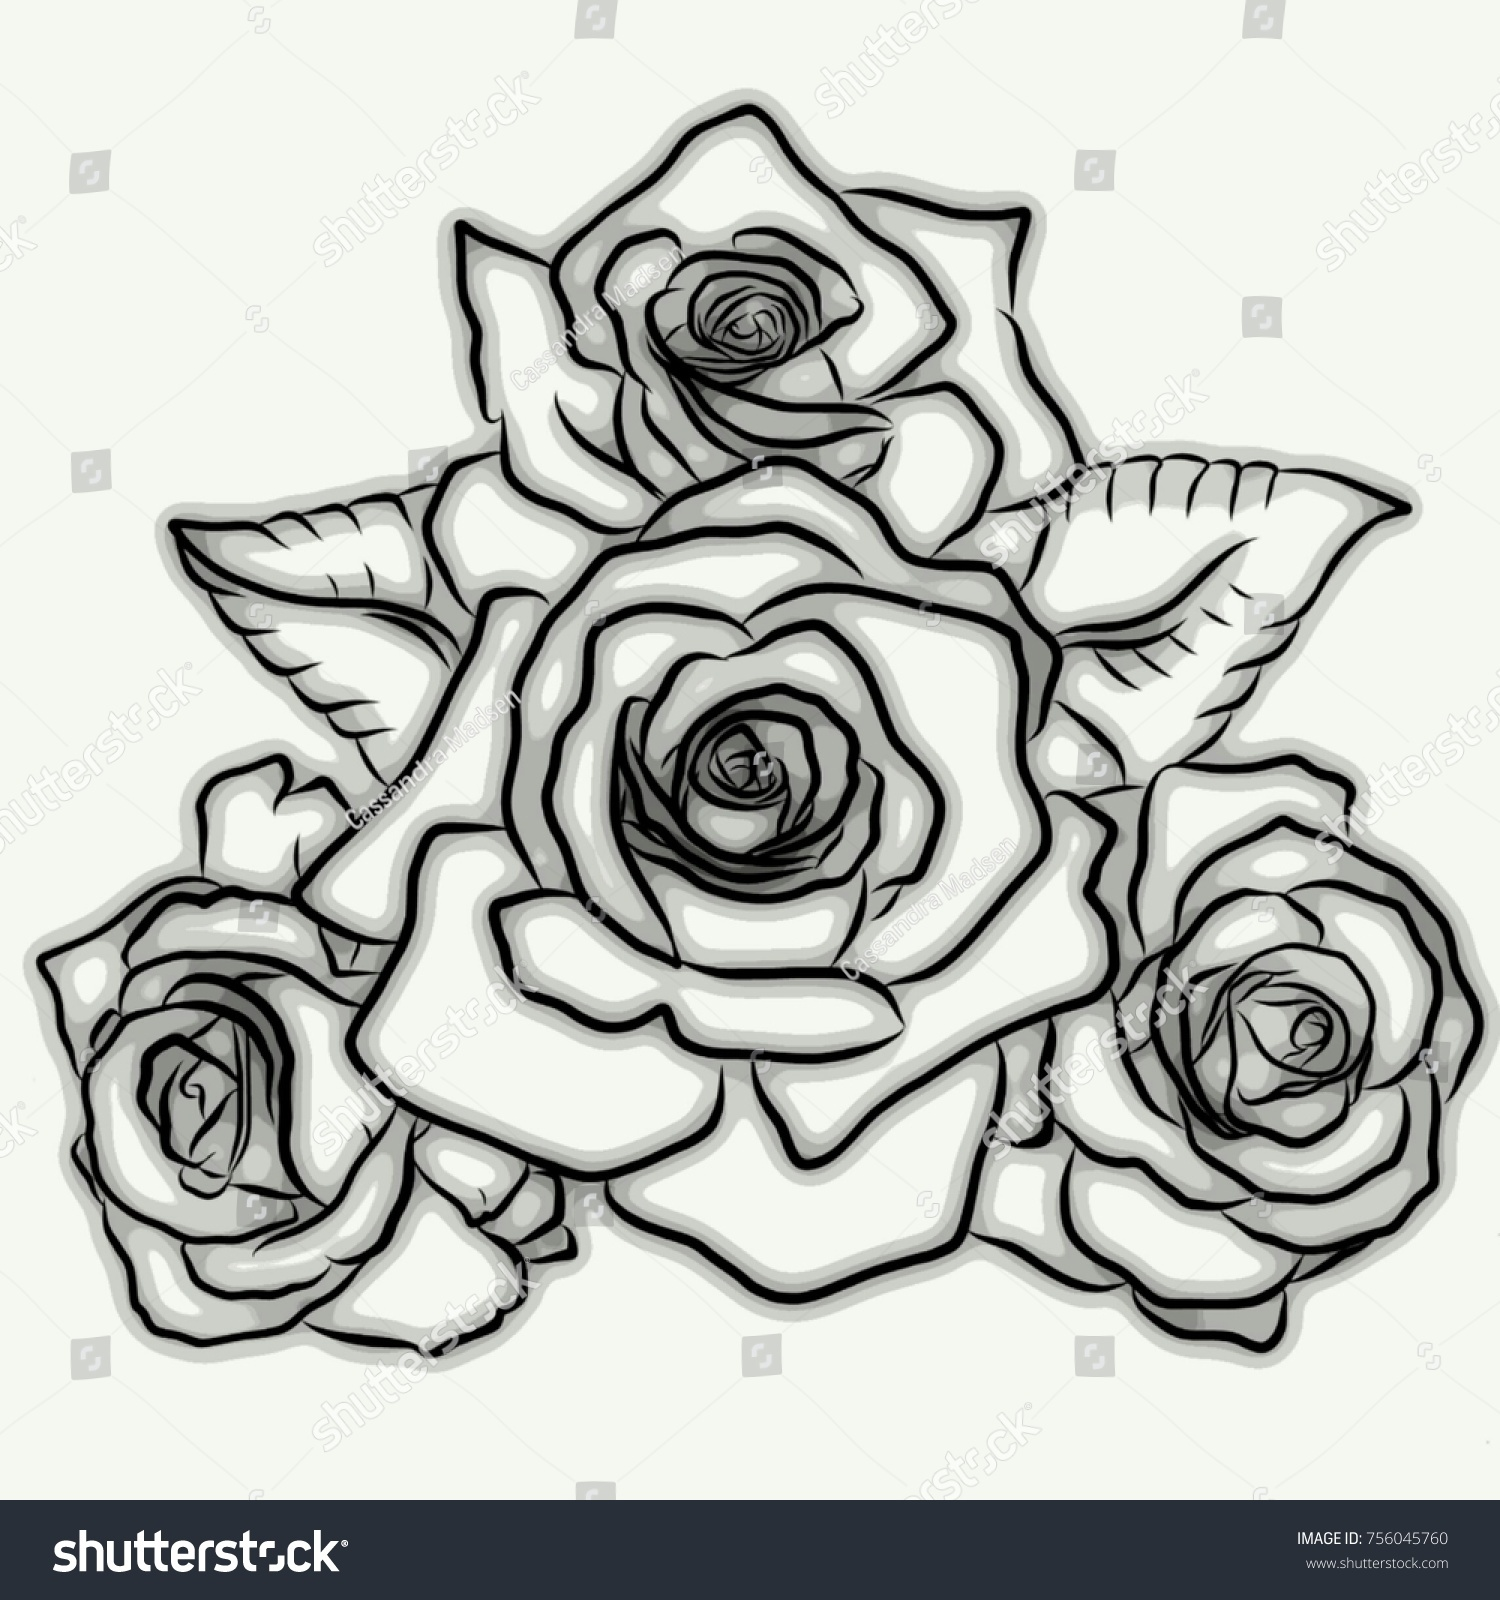 Black Grey Digitally Illustrated Tattoo Design Stock Illustration